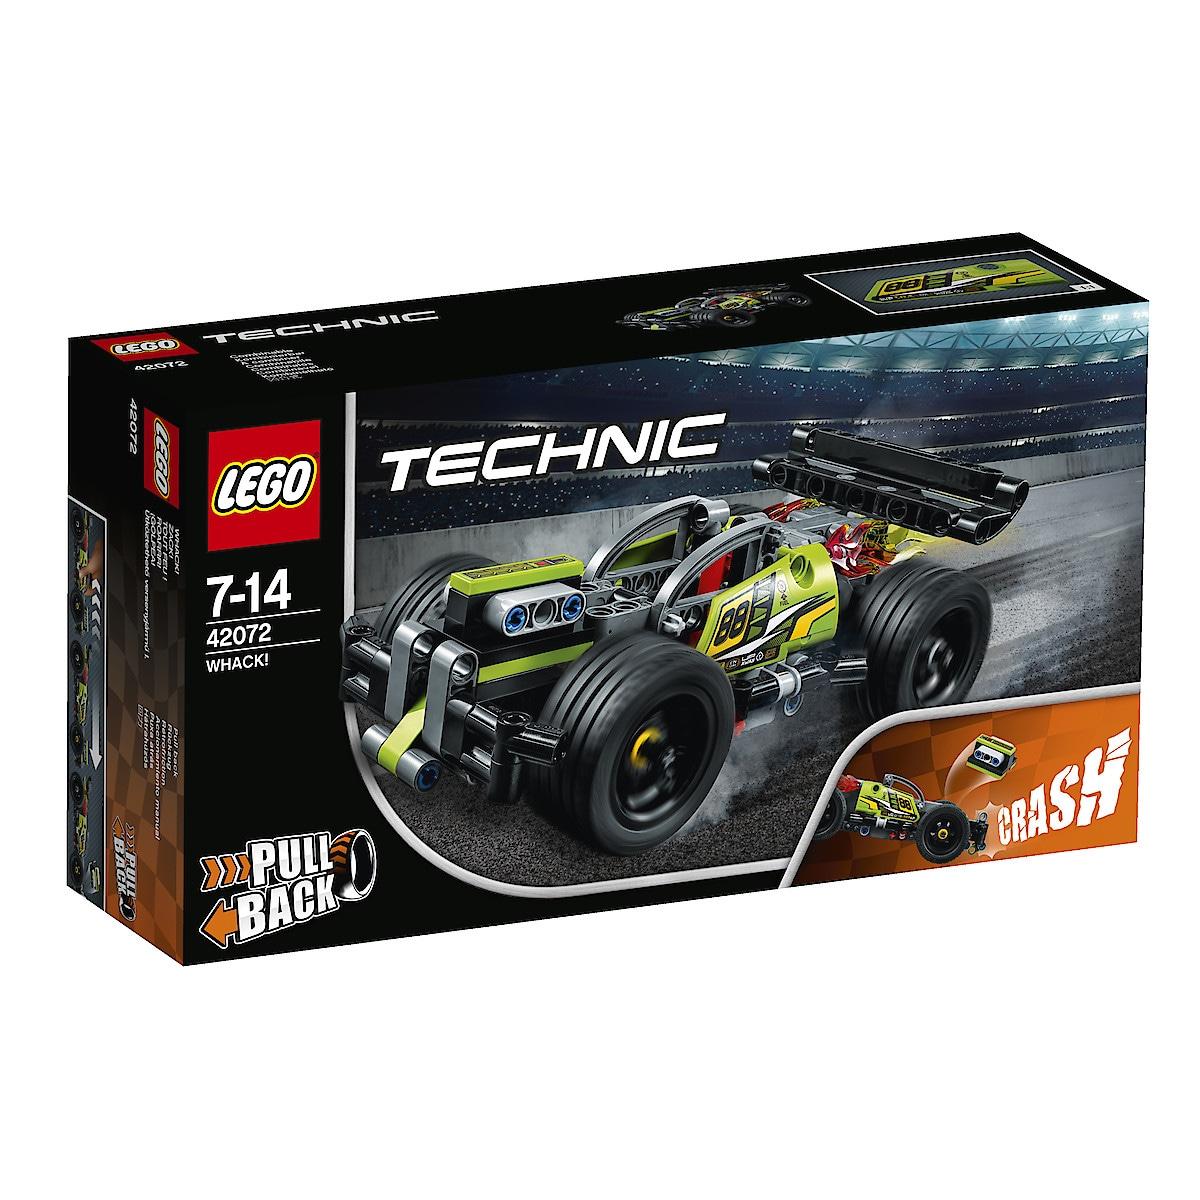 LEGO Technic 42072, Whack!